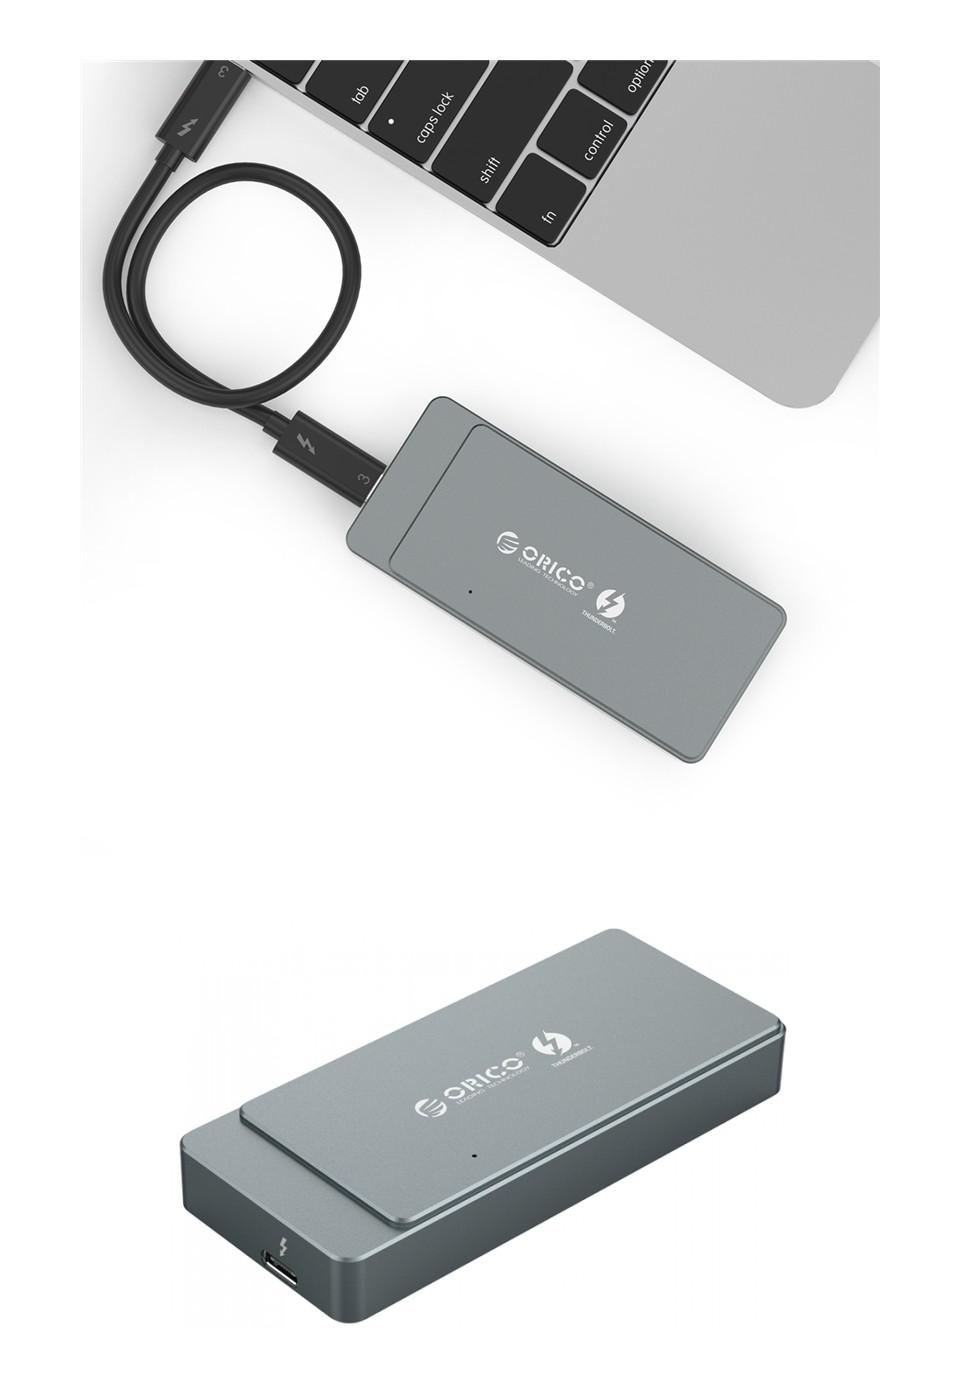 Orico Thunderbolt 3 M.2 NVME Enclosure Silver product